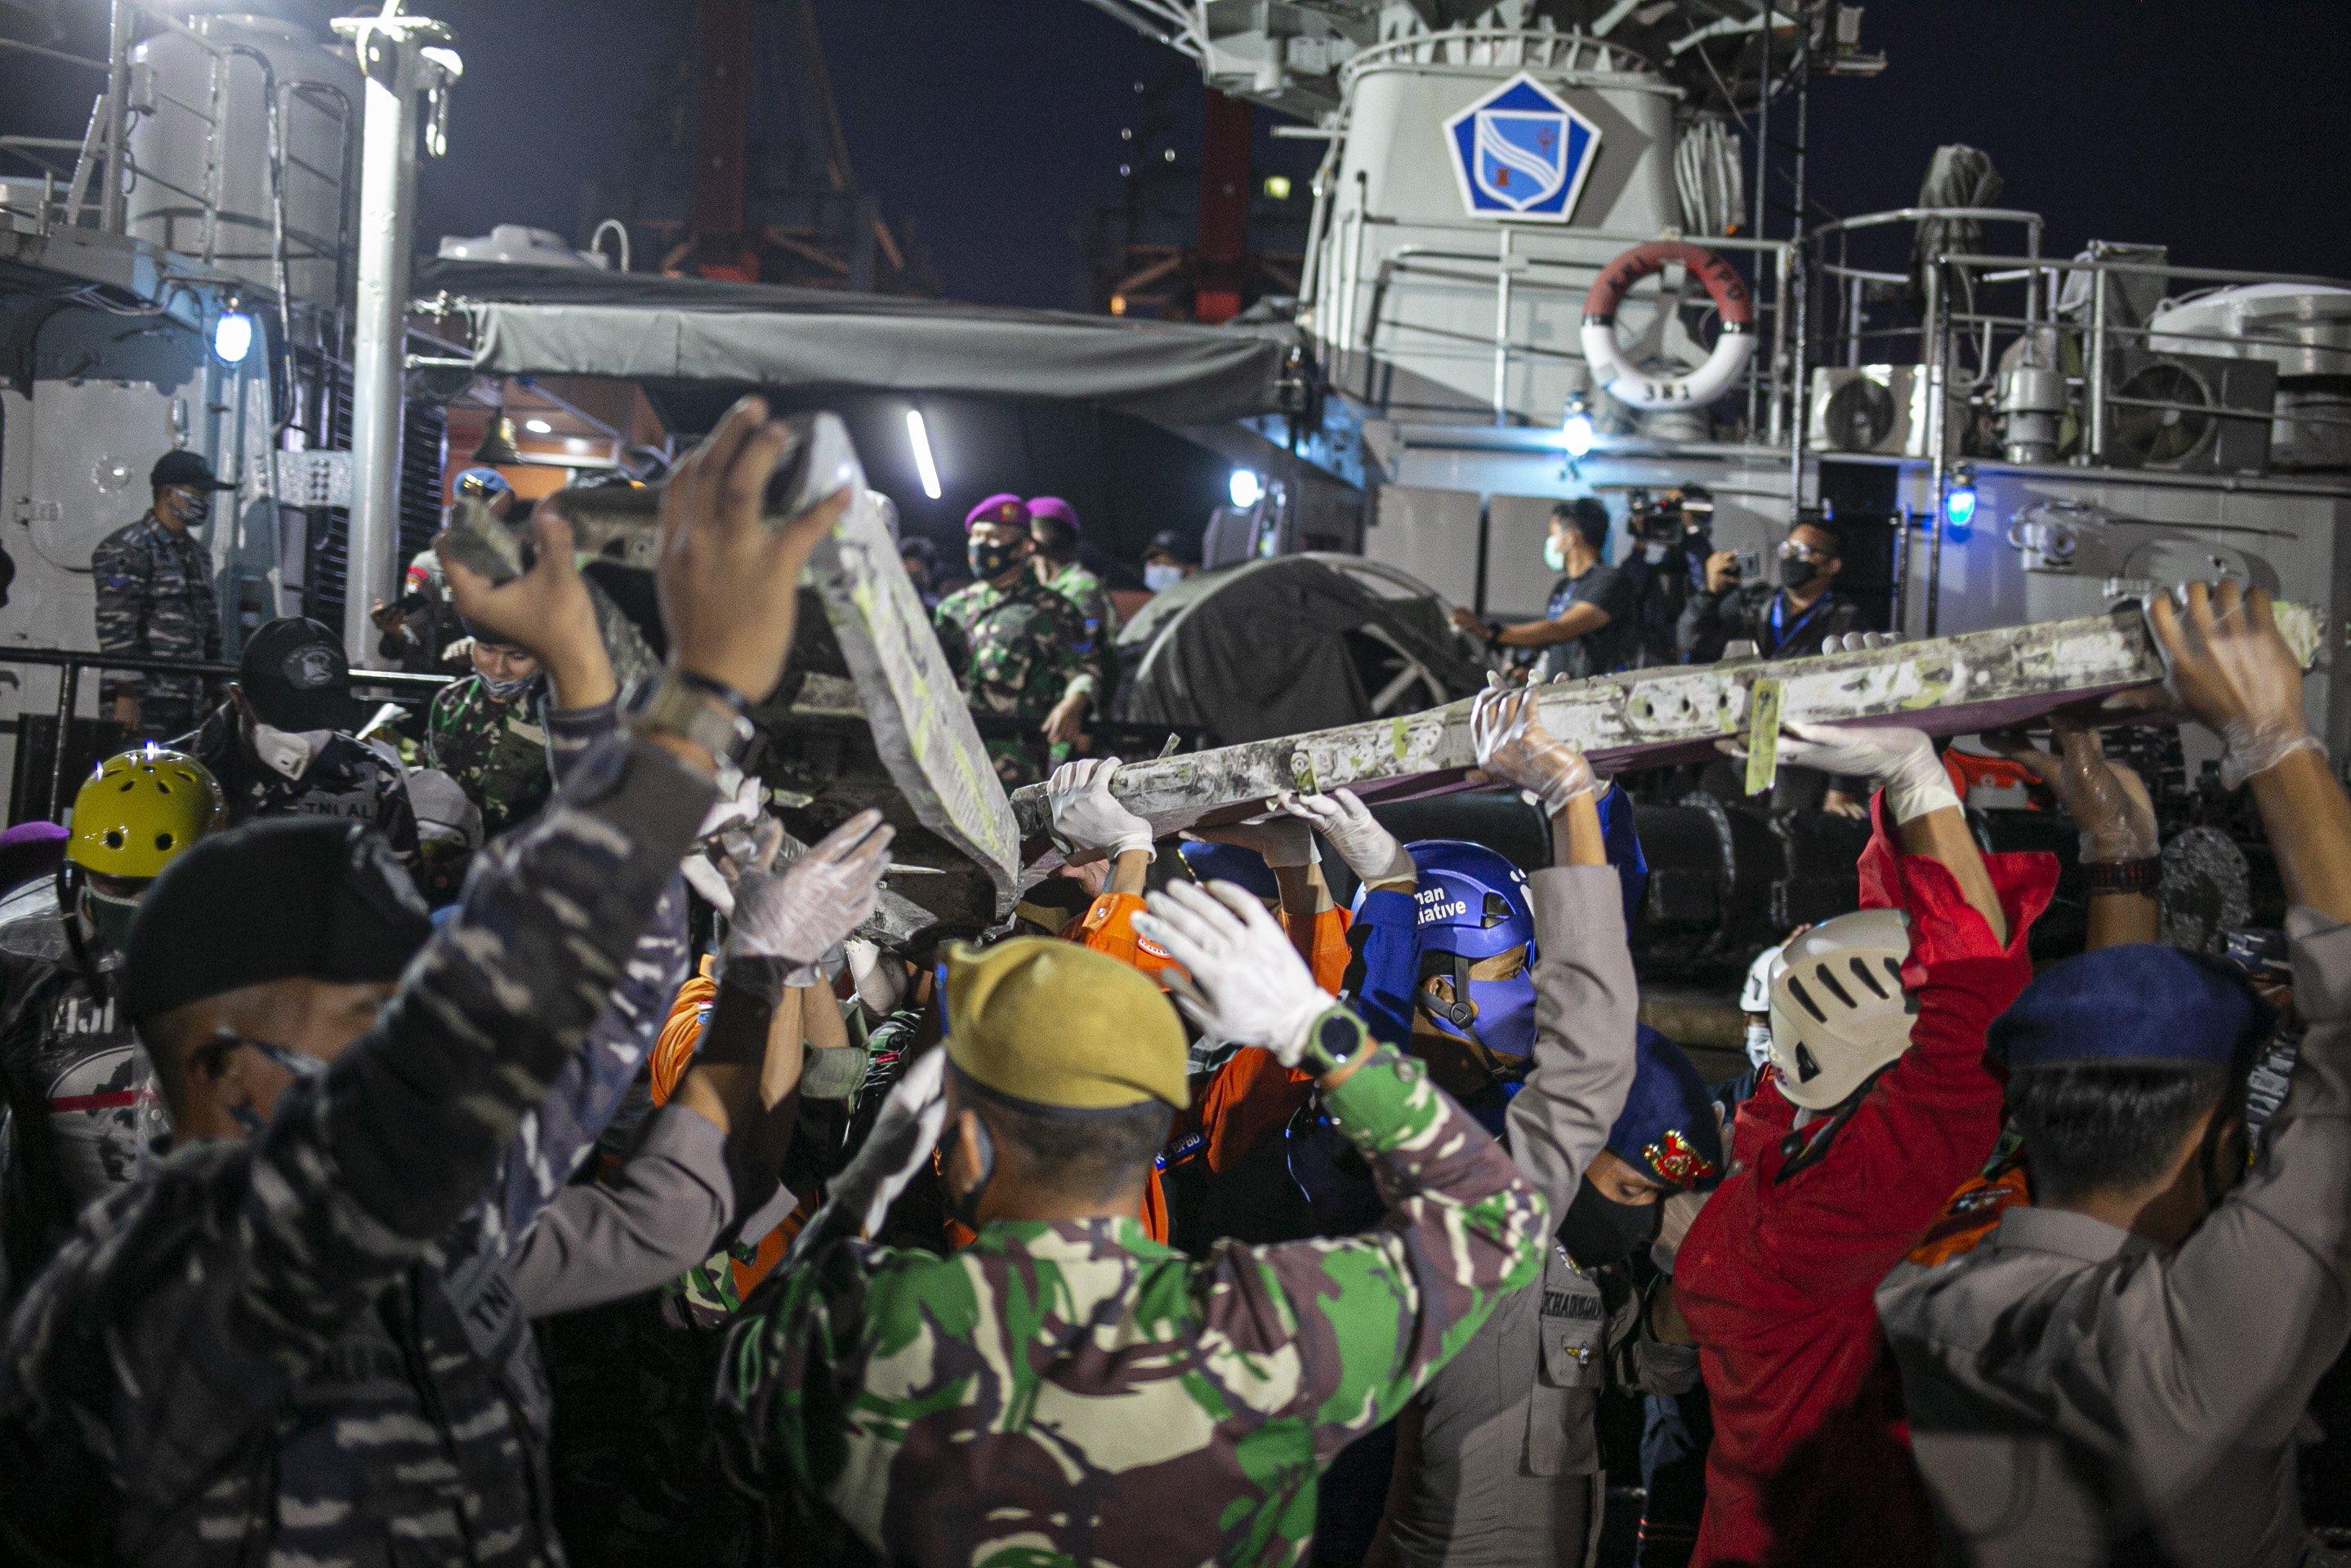 Petugas membawa bagian pesawat Sriwijaya Air SJ182 rute Jakarta - Pontianak yang jatuh di perairan Pulau Seribu di Dermaga JICT, Tanjung Priok, Jakarta Utara, Minggu (10/1/2021). Temuan bagian pesawat selanjutnya akan diperiksa oleh Komite Nasional Keselamatan Transportasi (KNKT) sedangkan potongan tubuh korban diserahkan kepada DVI Polri untuk identifikasi lebih lanjut.